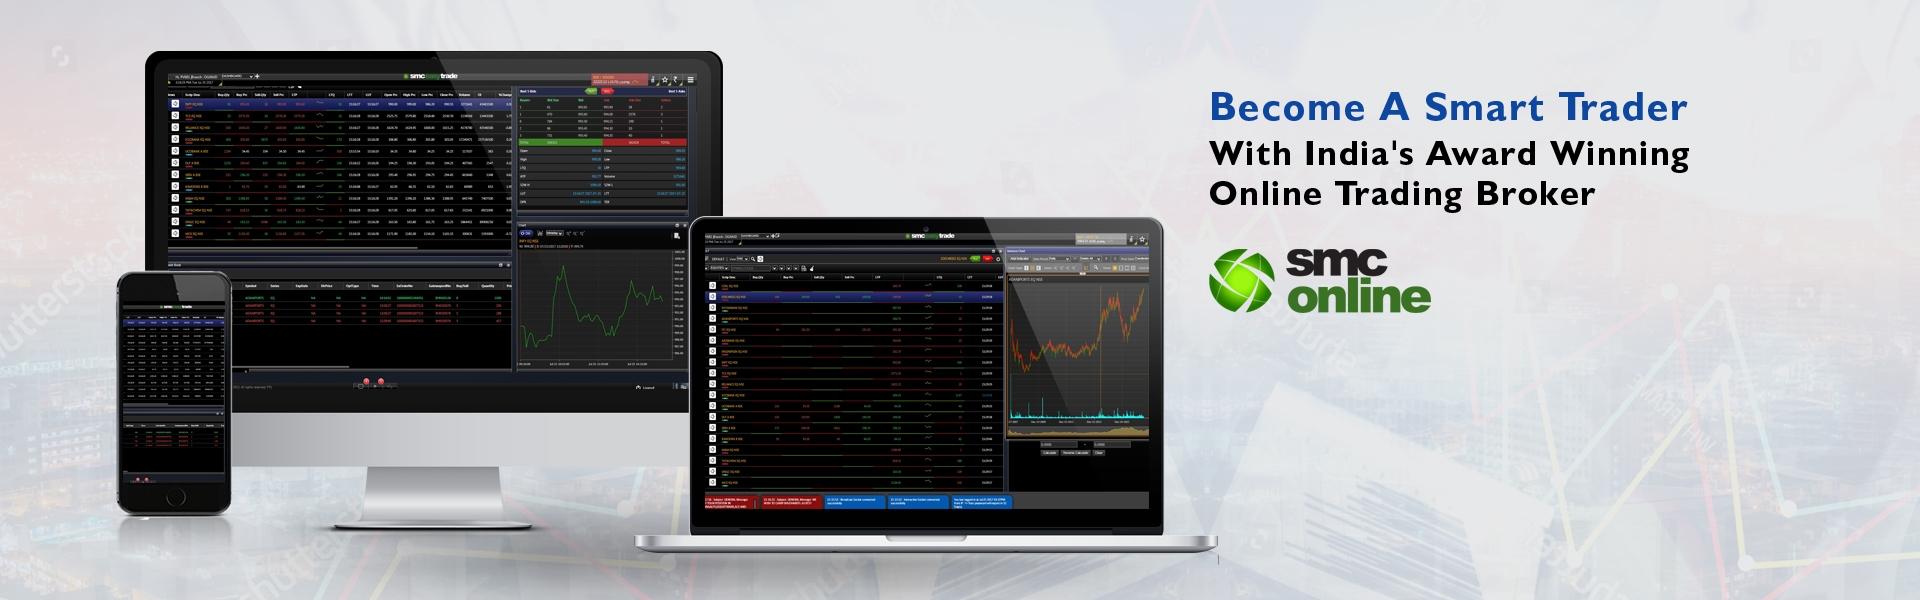 SMC Trade Online (@smctradeonline) Cover Image